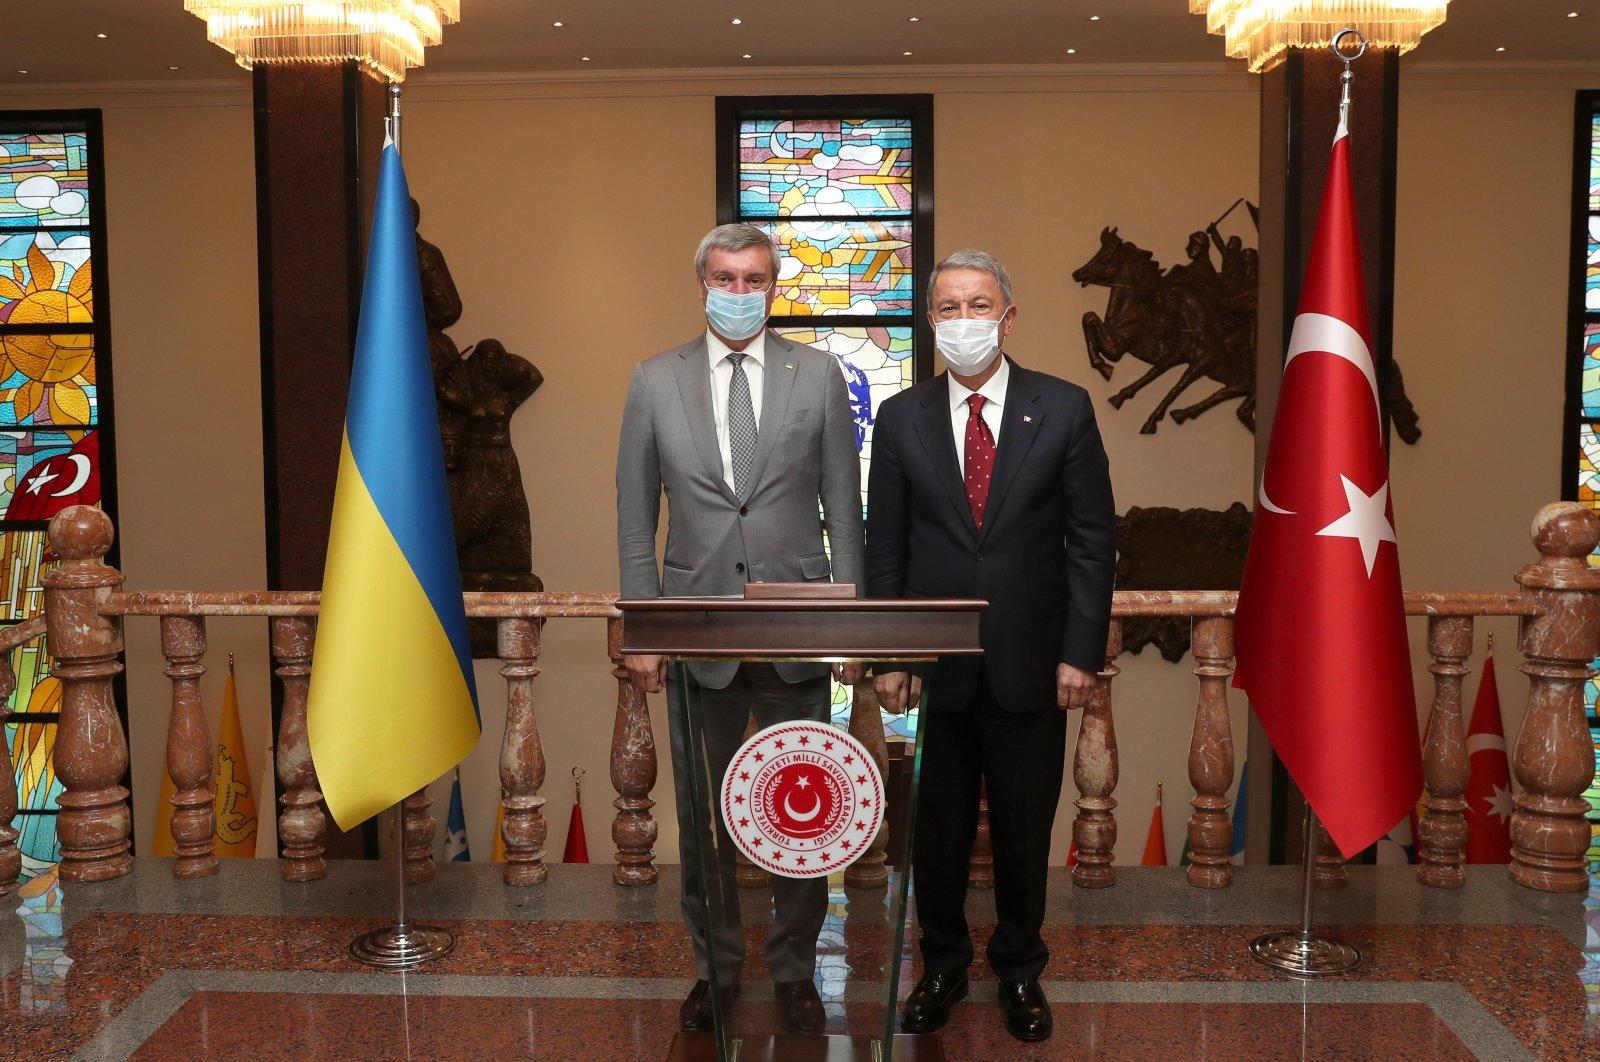 Ukrainian Vice Prime Minister Oleh Urusky (L) poses with Turkish Defense Minister Hulusi Akar during an official visit to Ankara, Turkey, Sept. 1, 2020. (AA Photo)